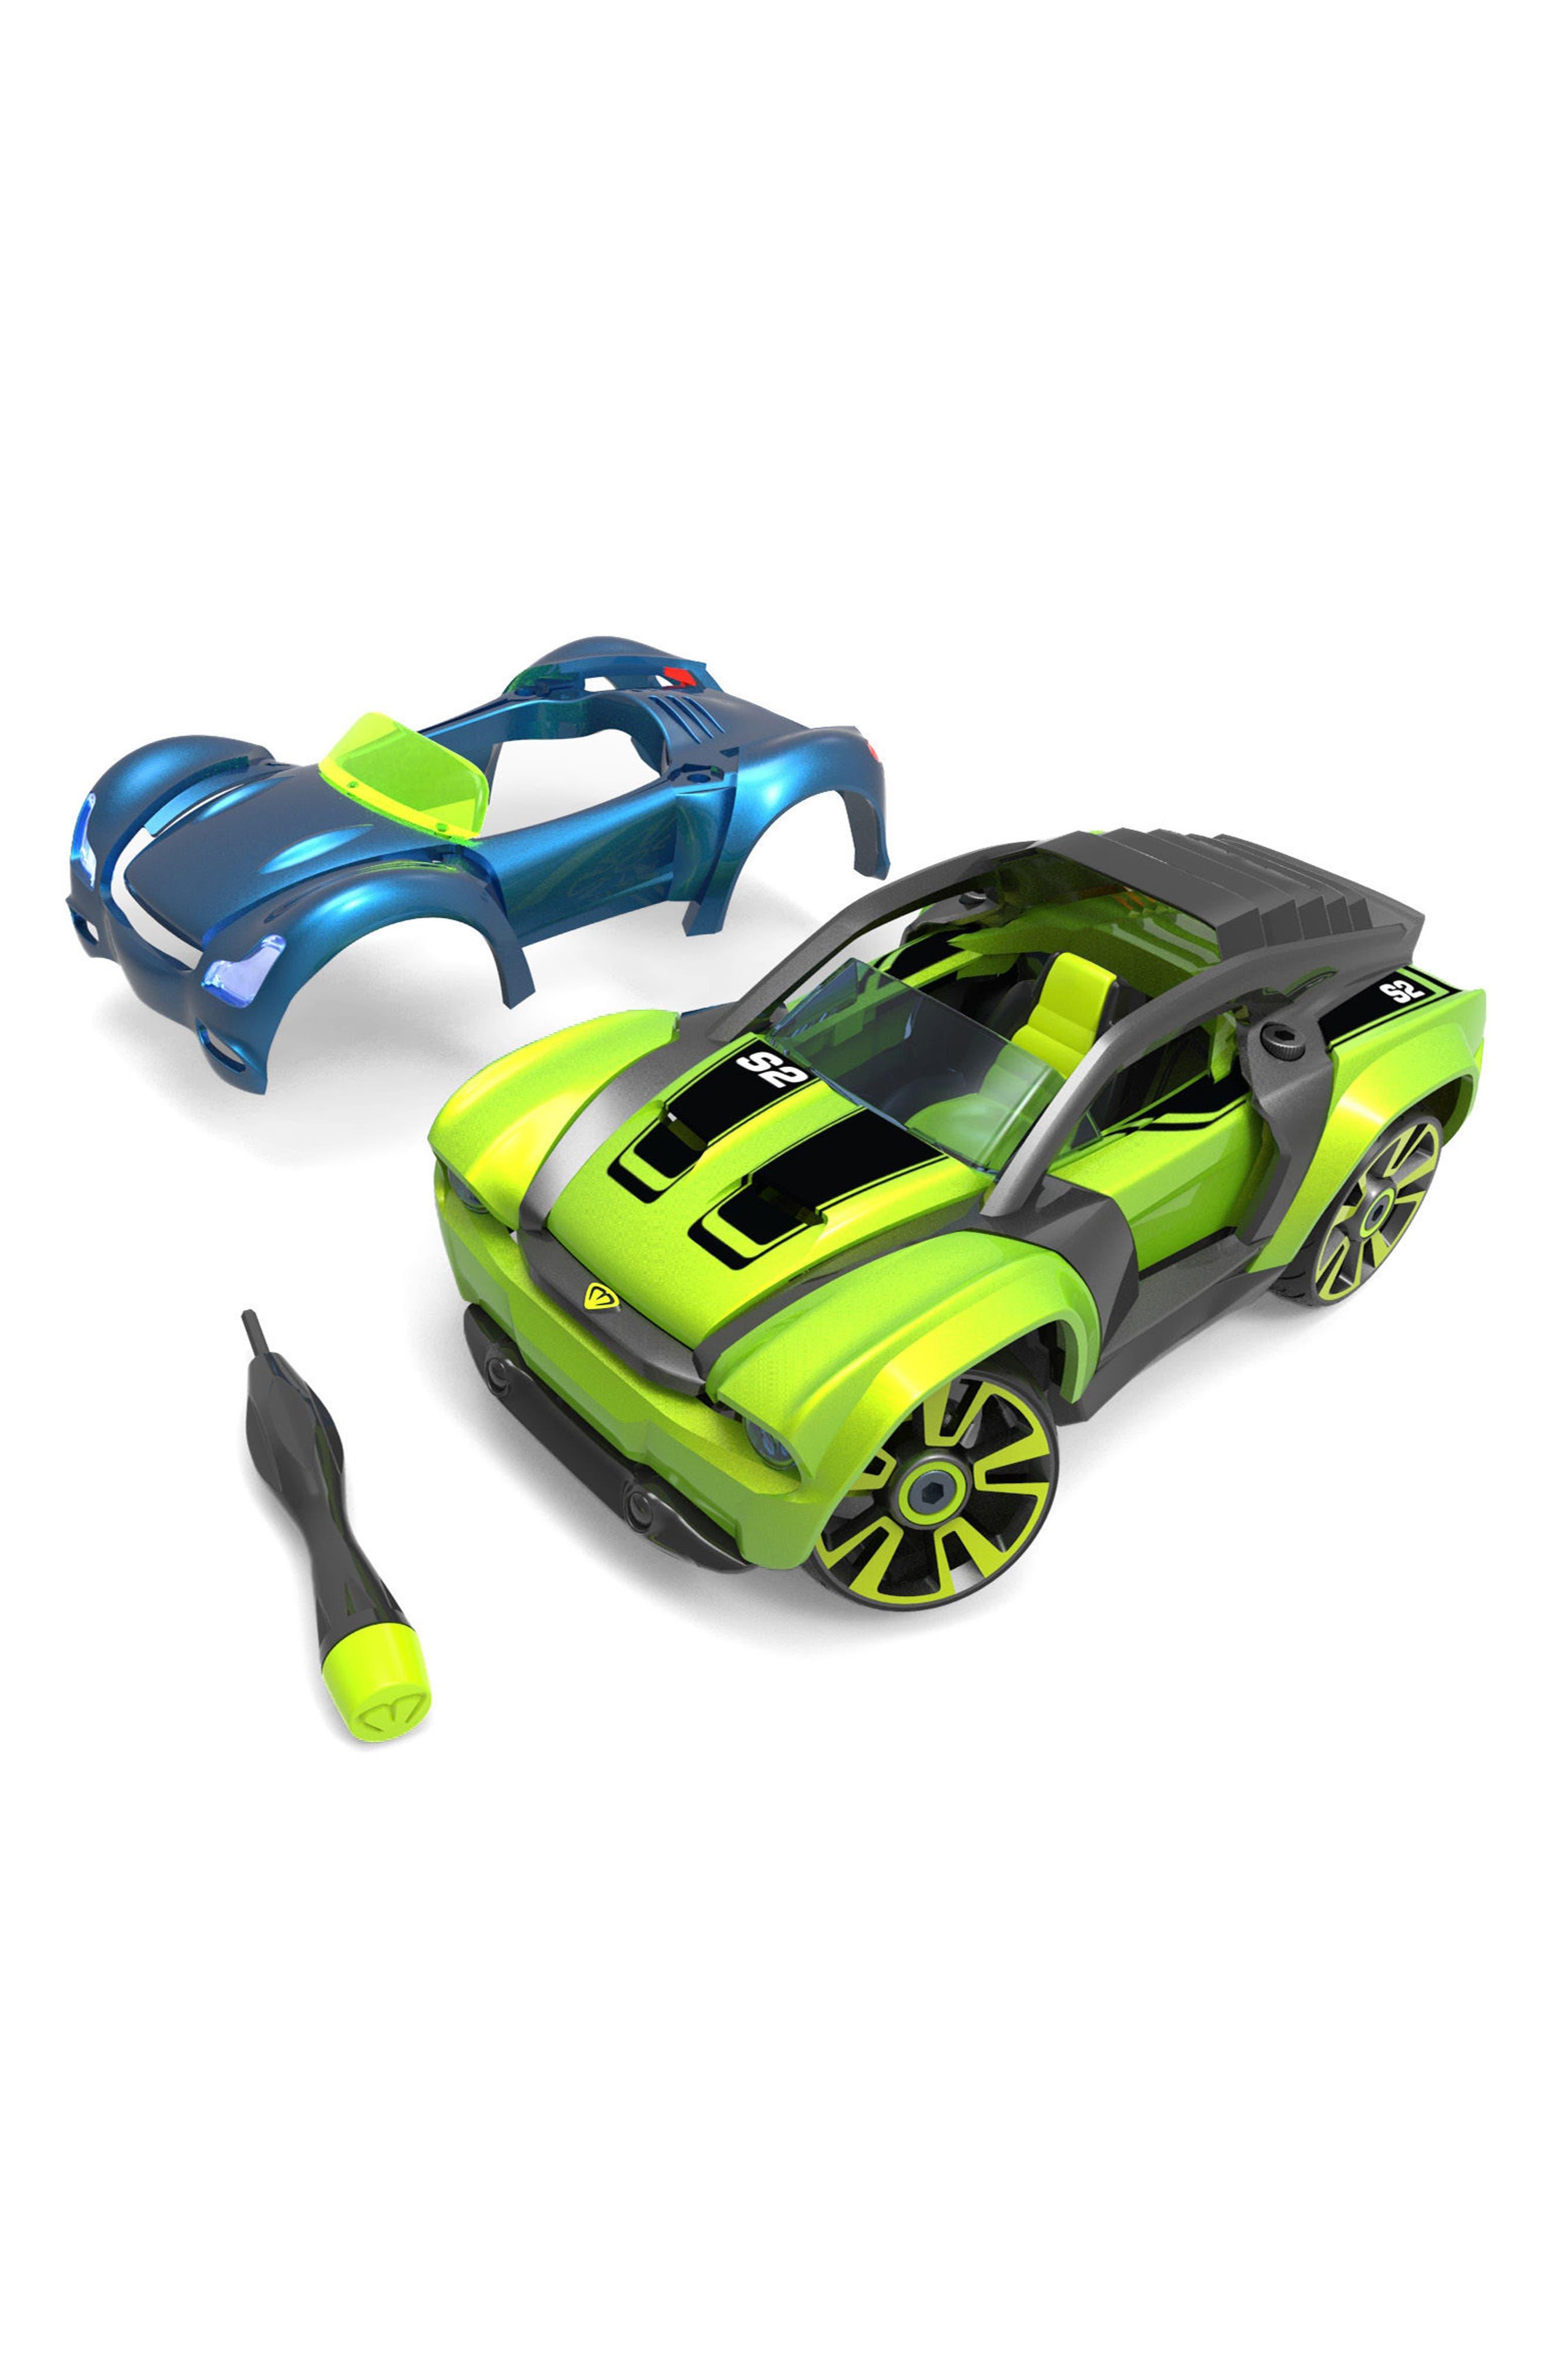 Modarri Delux S2 Muscle Car Kit